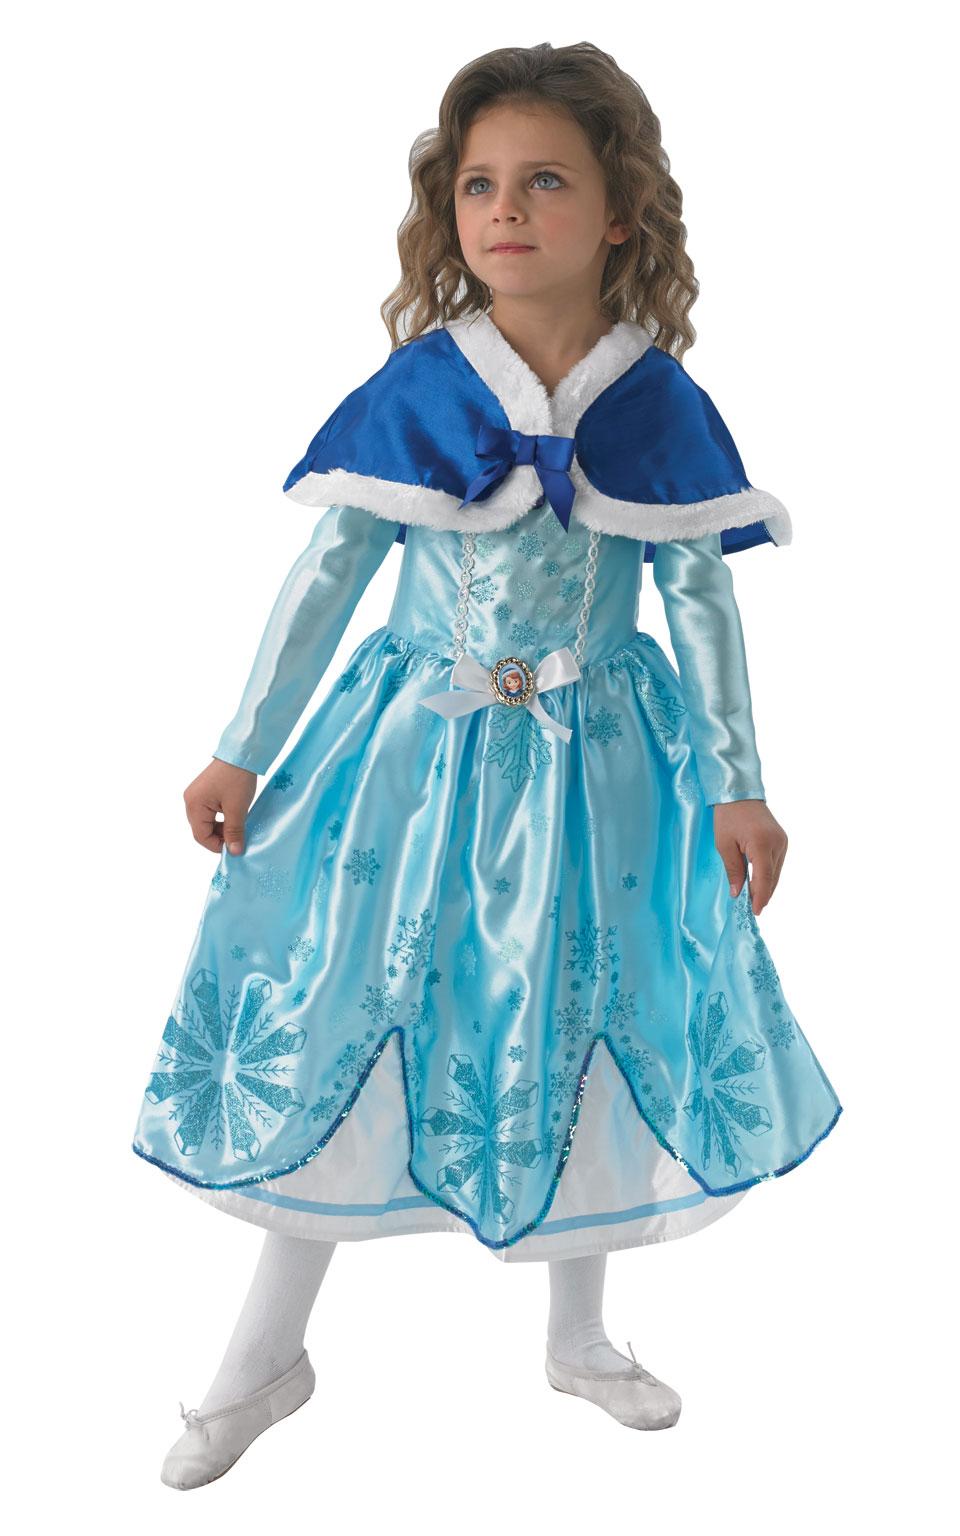 a63bcb328eb0 Childs Disney Princess Sofia The First Fancy Dress Kids Winter Costume Blue  Sc 1 St Wonderland Party